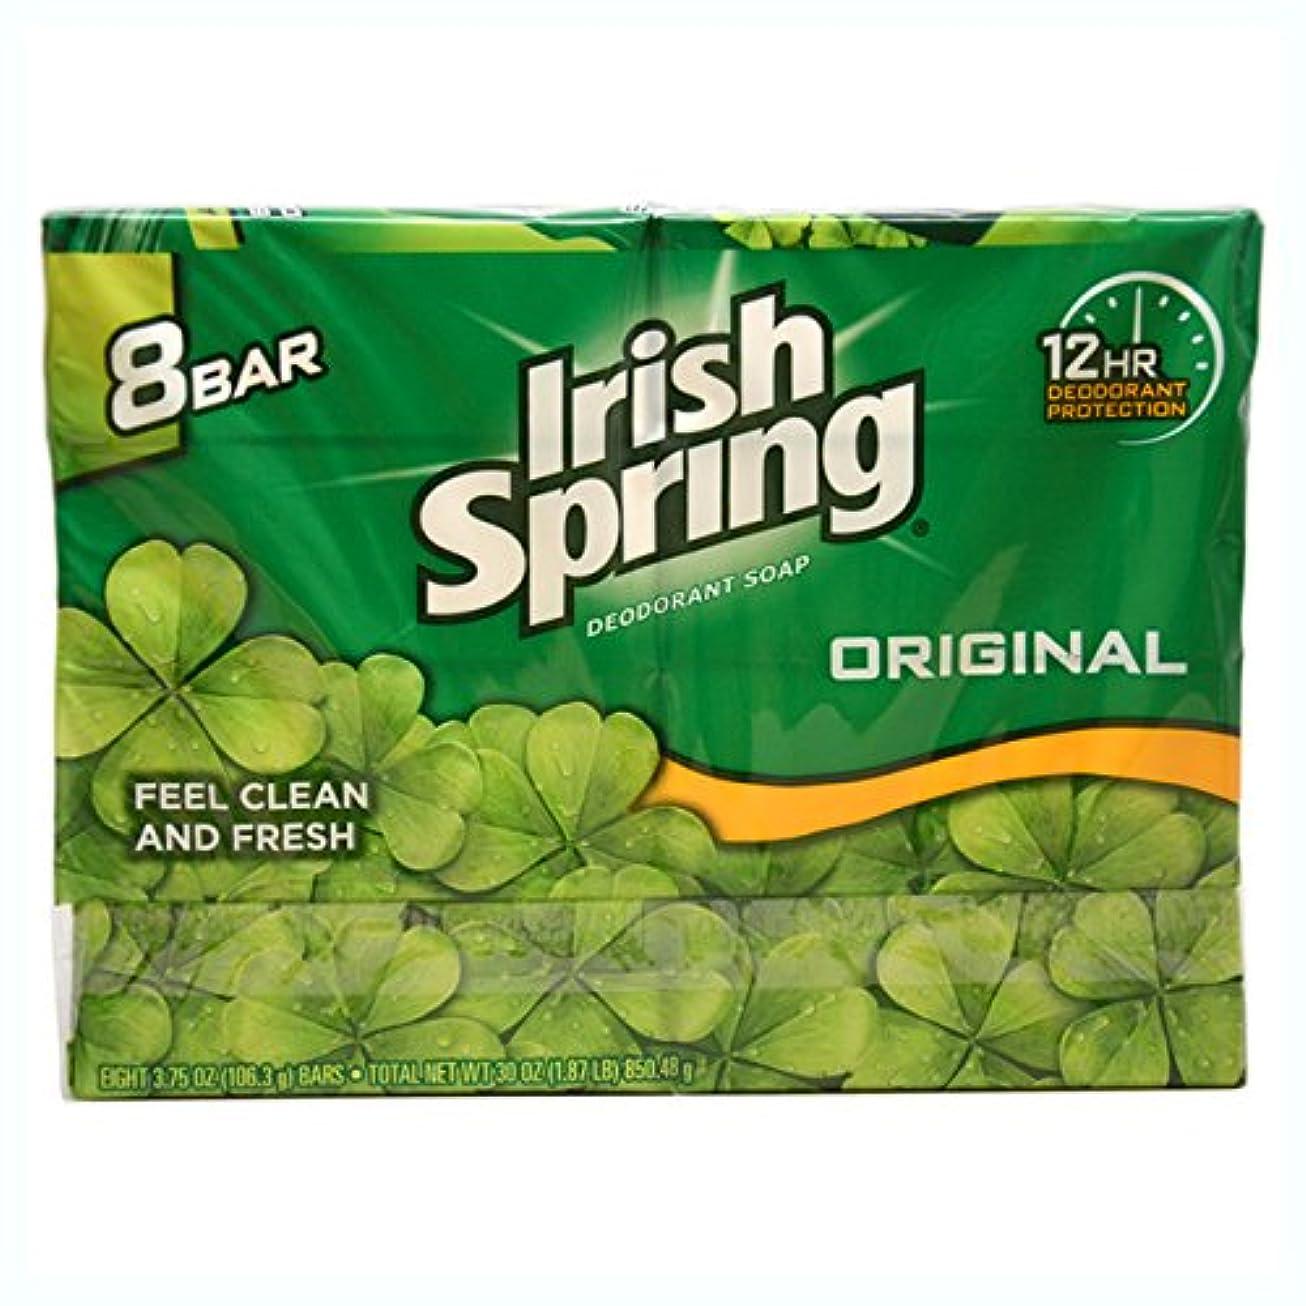 Irish Spring デオドラントソープオリジナル - 8のCt